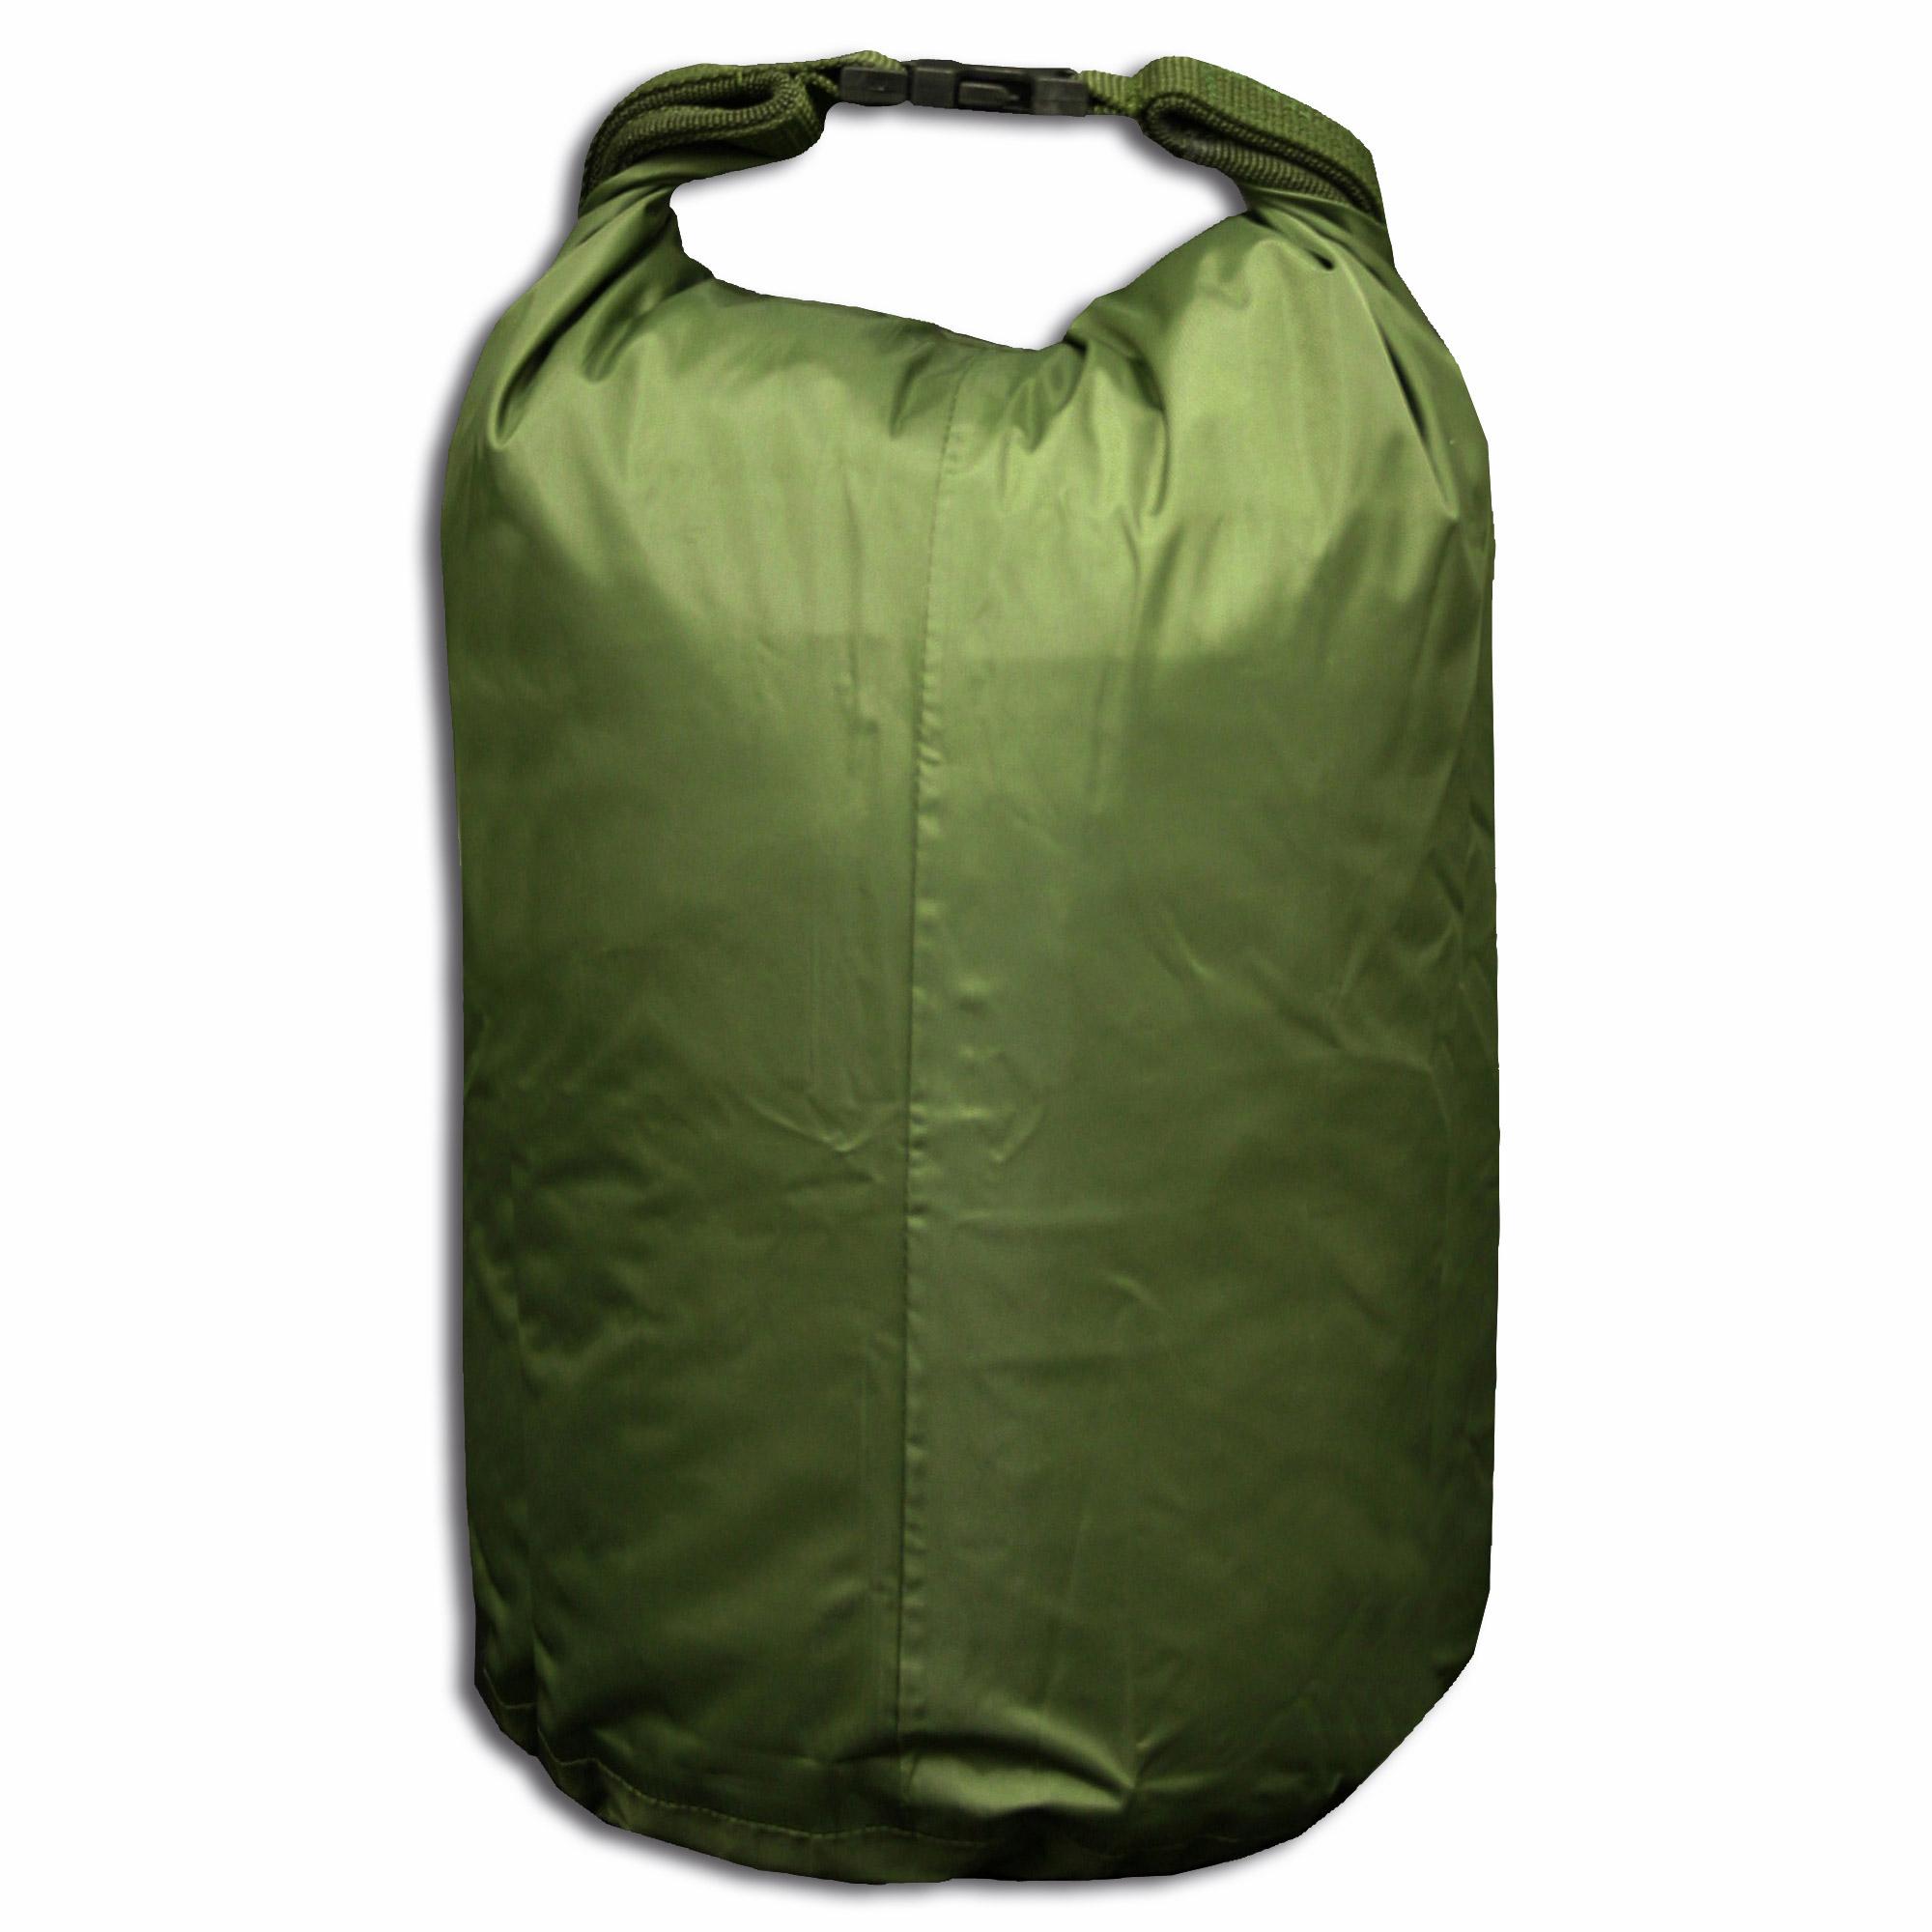 Bolsa de transporte MFH pequeña verde oliva